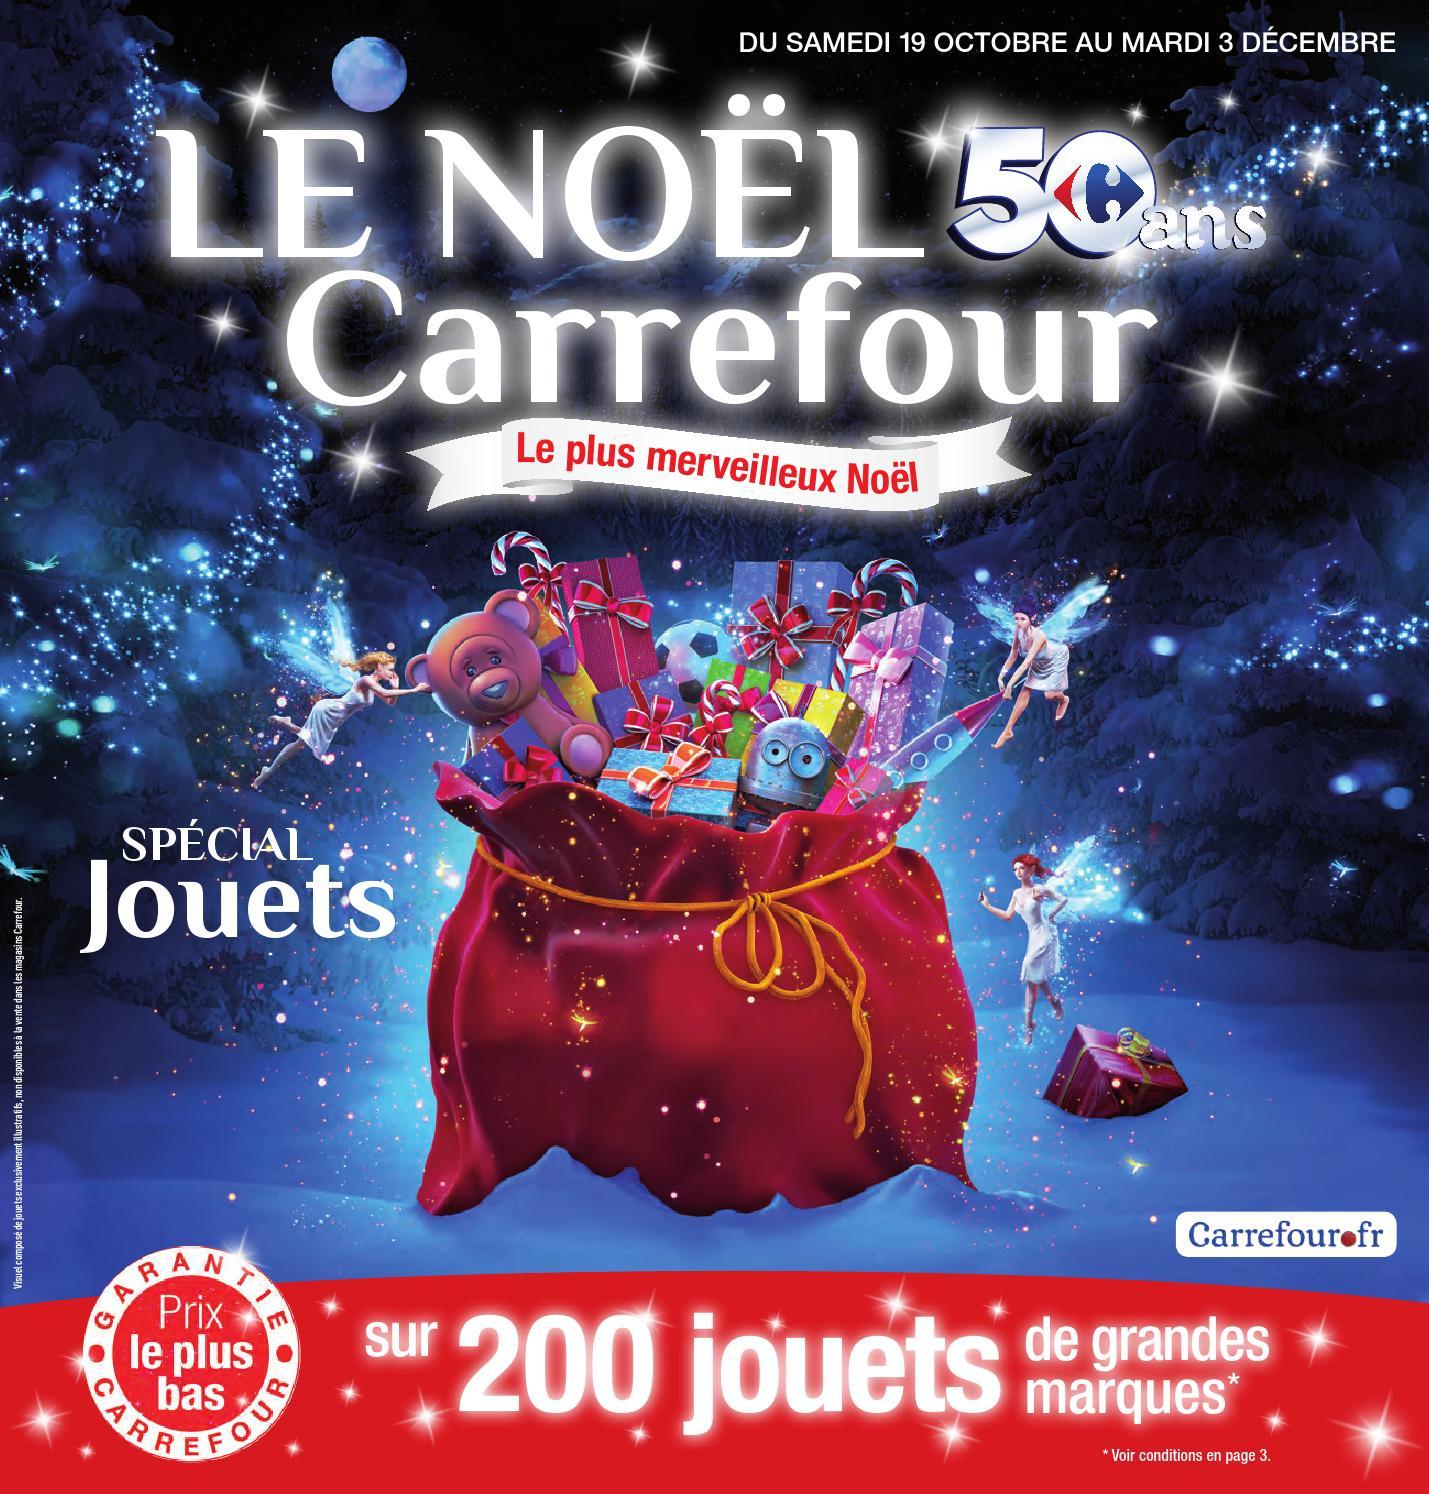 Carrefour Le Noël Carrefour Au 03 12 By Adclick Bvba - Issuu serapportantà Carrefour Piscine Hors Sol